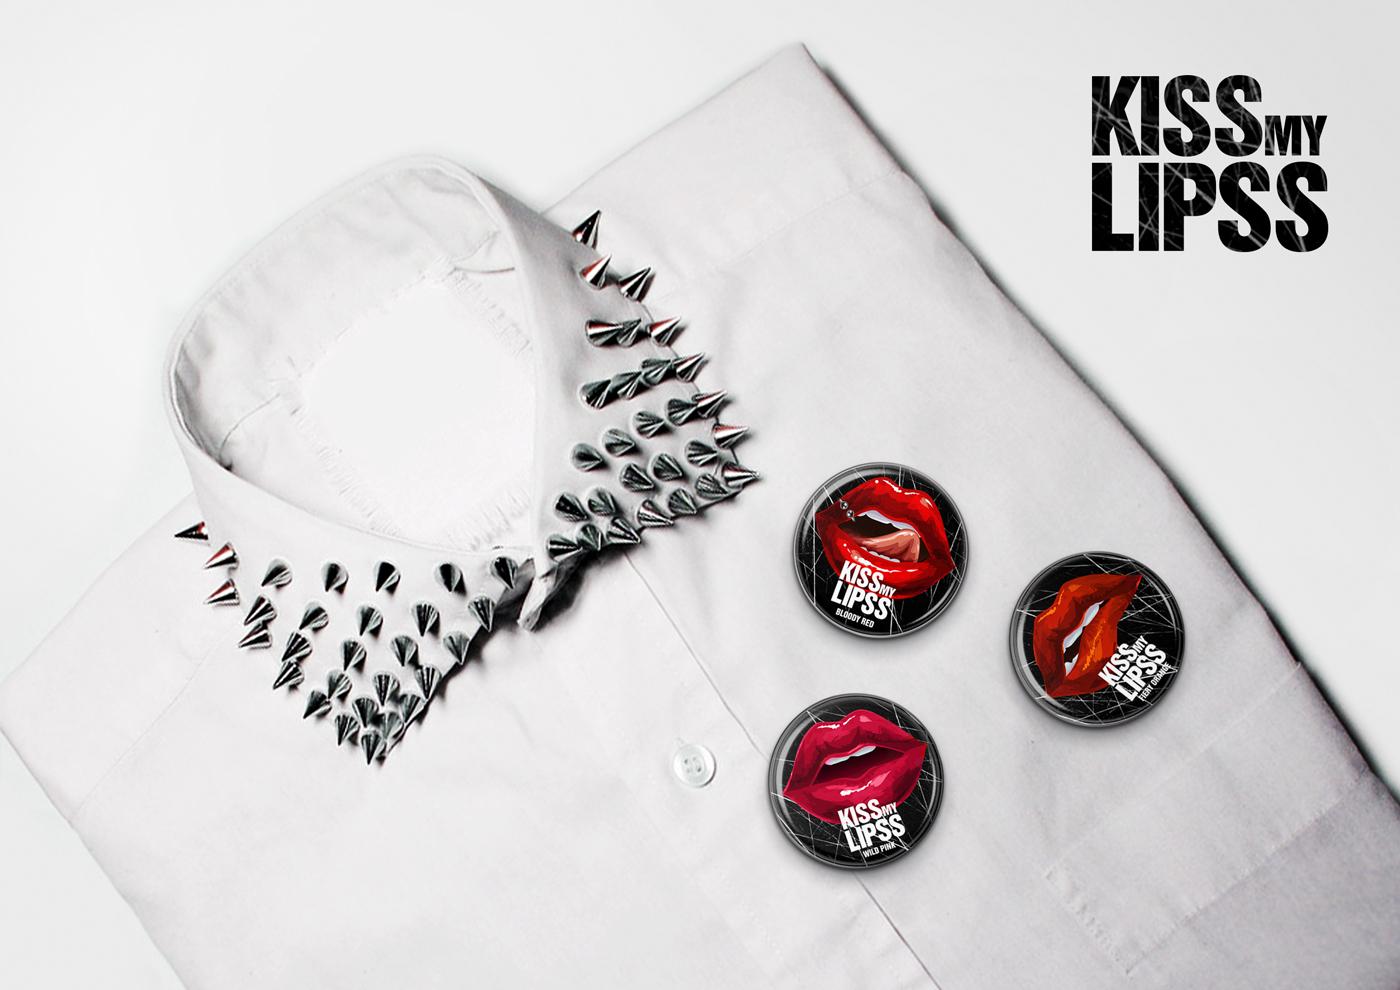 Дизайн упаковки блеска для губ KISS MY LIPS